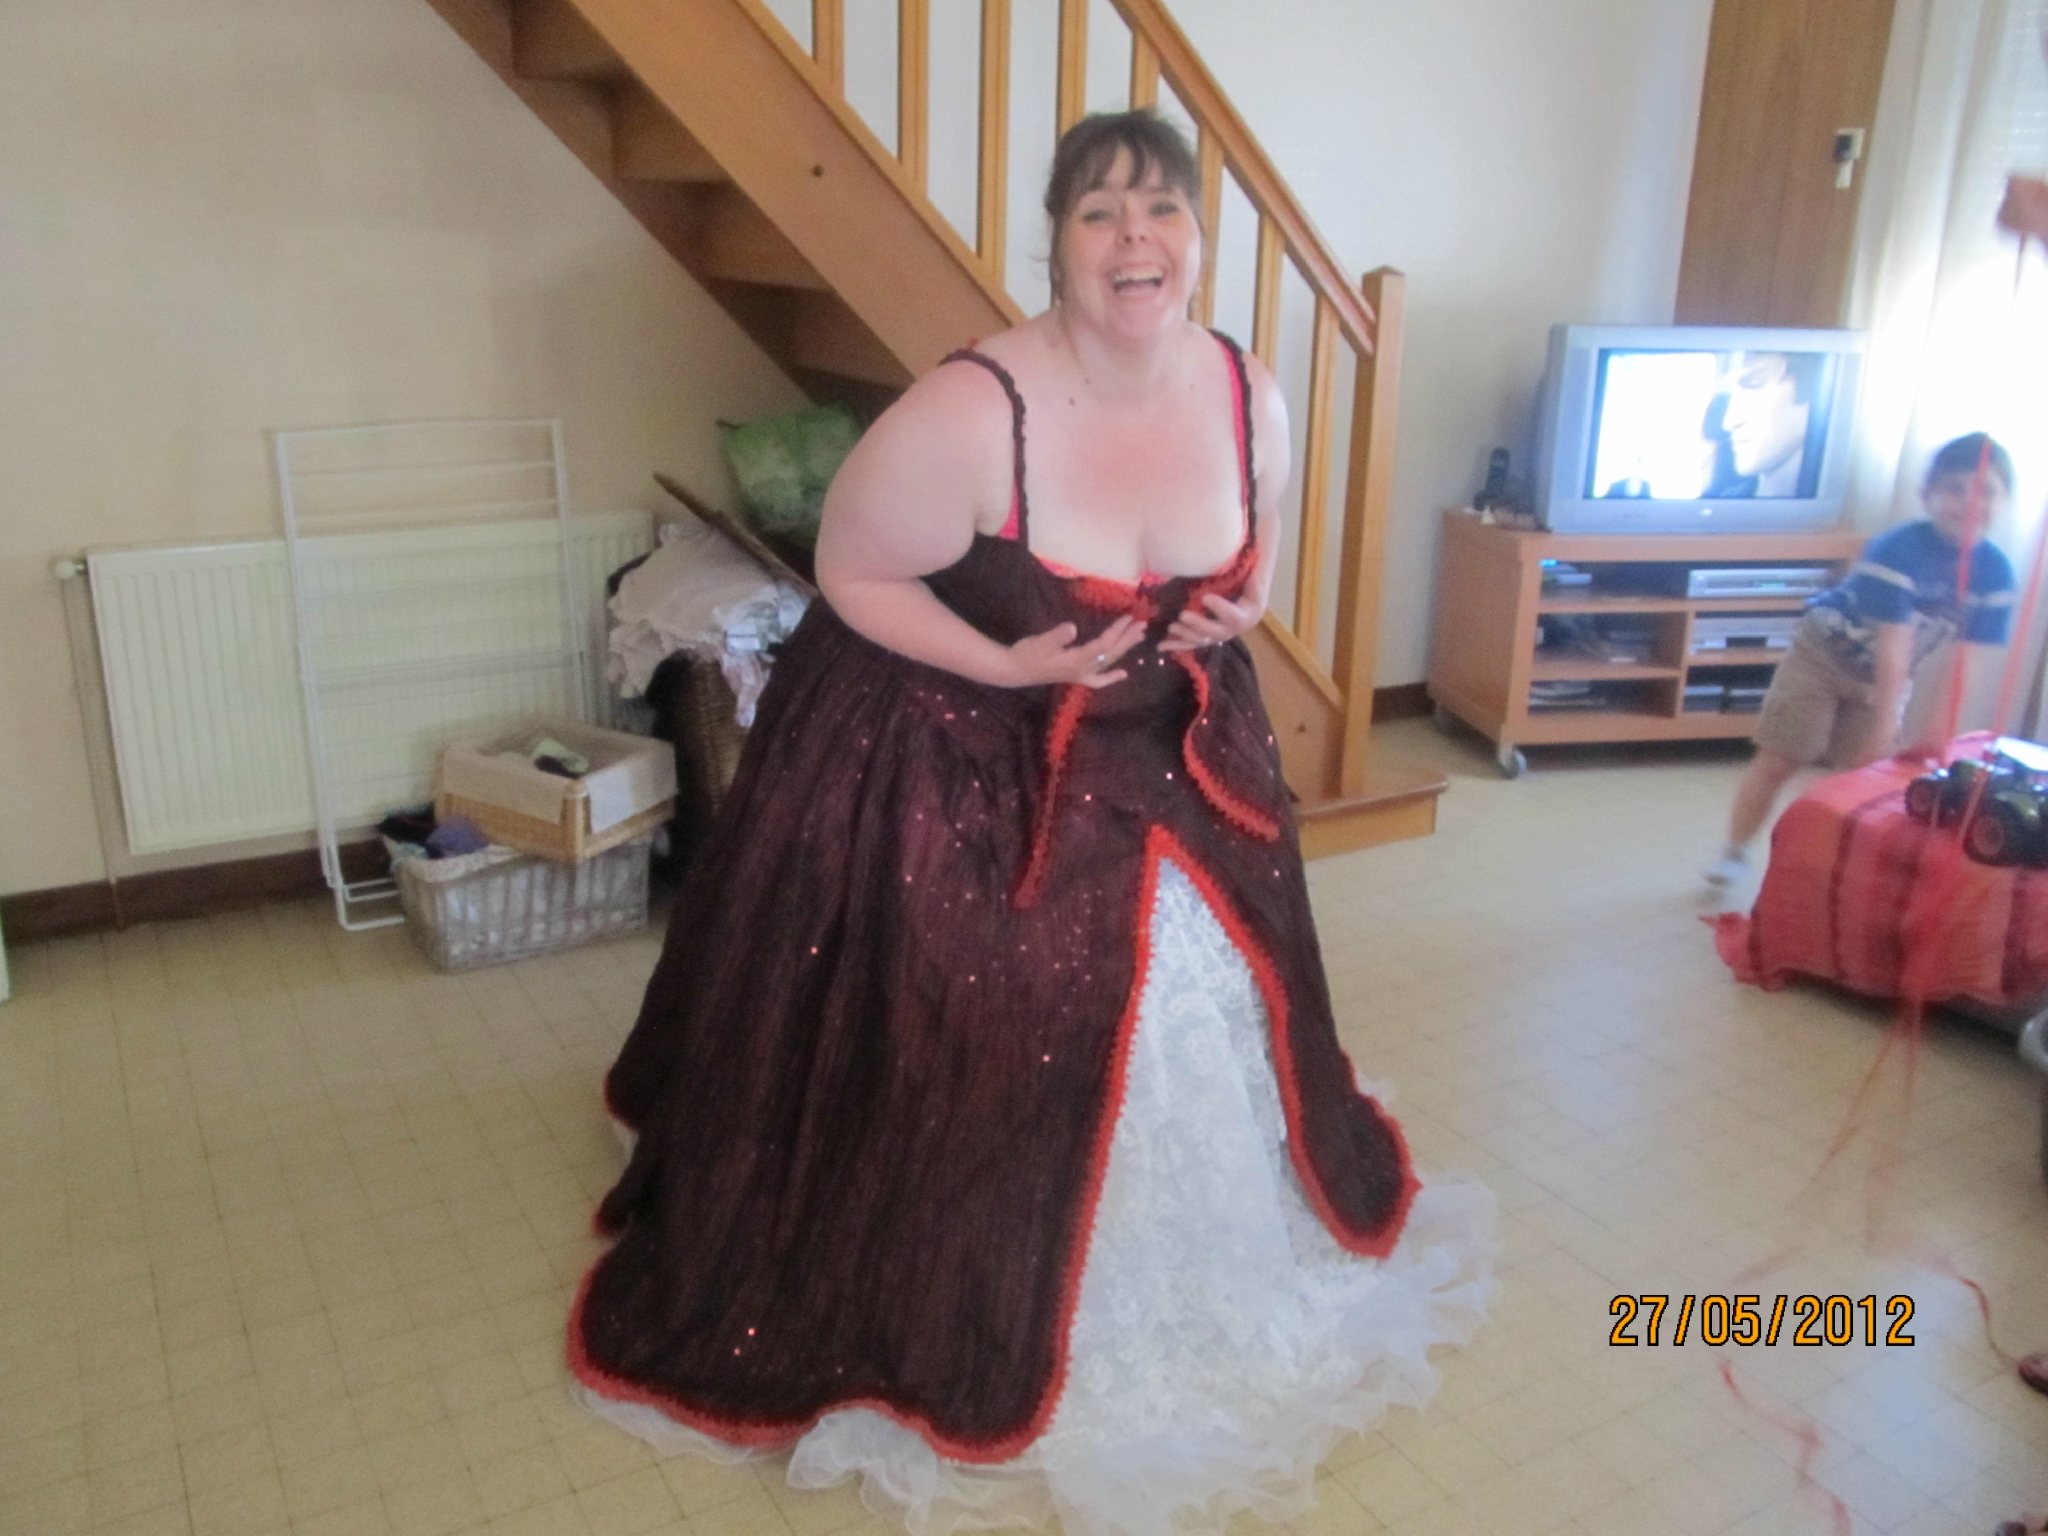 tenue femme pour mariage grande taille pr t porter f minin et masculin. Black Bedroom Furniture Sets. Home Design Ideas